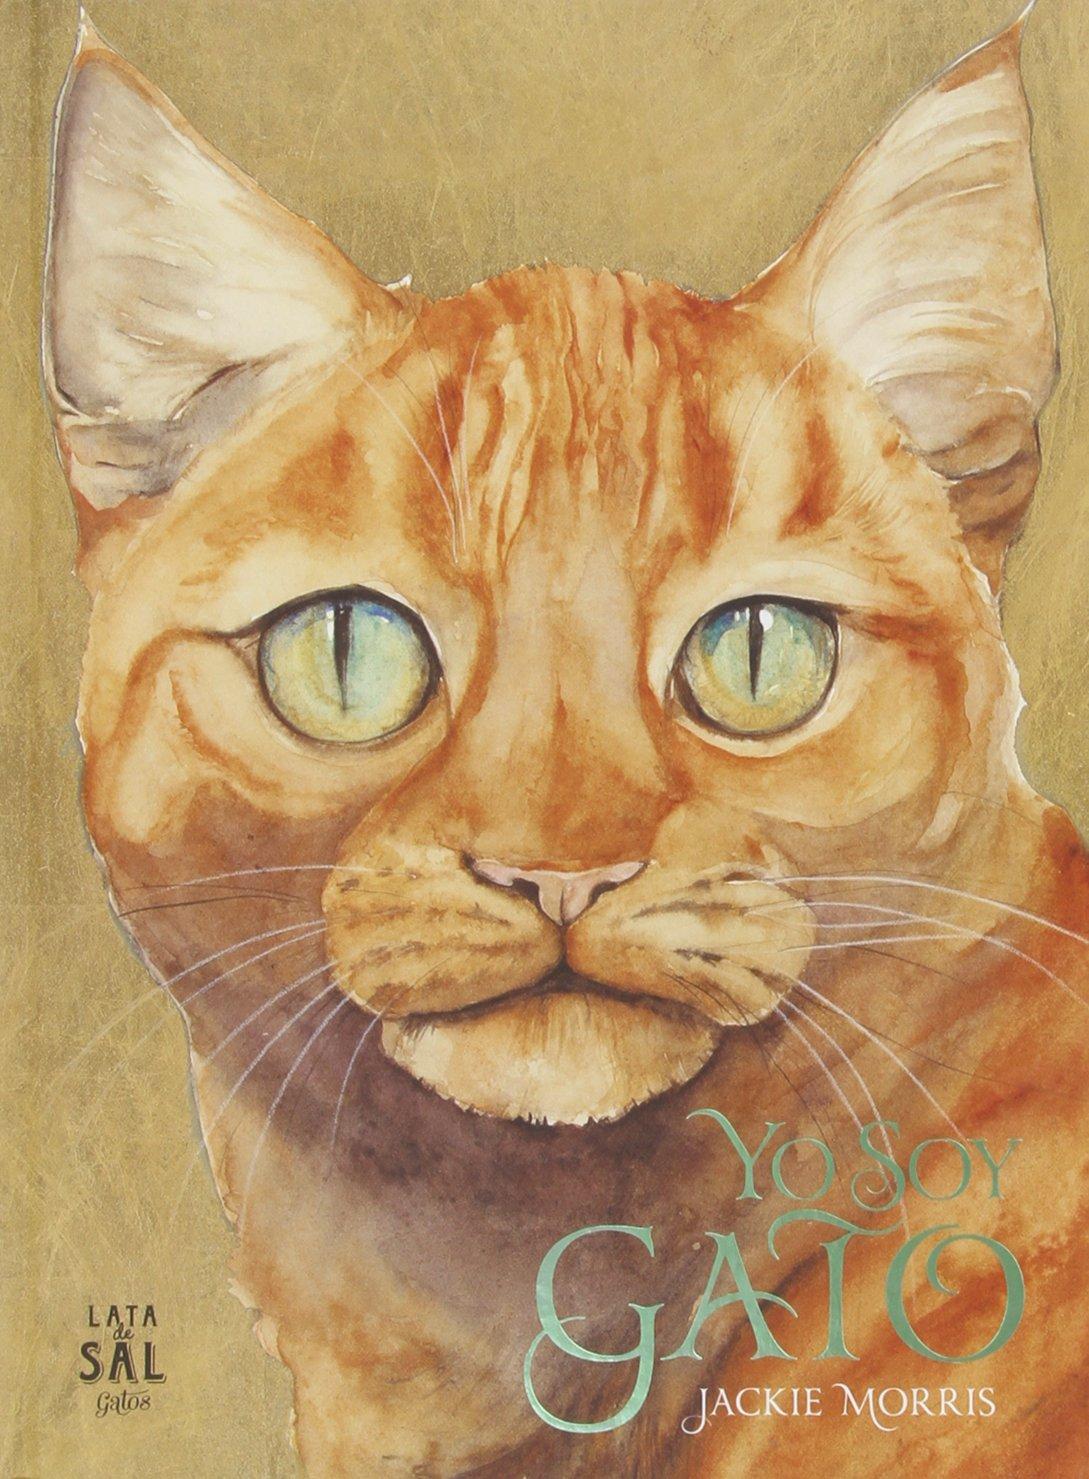 Yo soy Gato (Spanish Edition) (Spanish) Hardcover – February 27, 2015